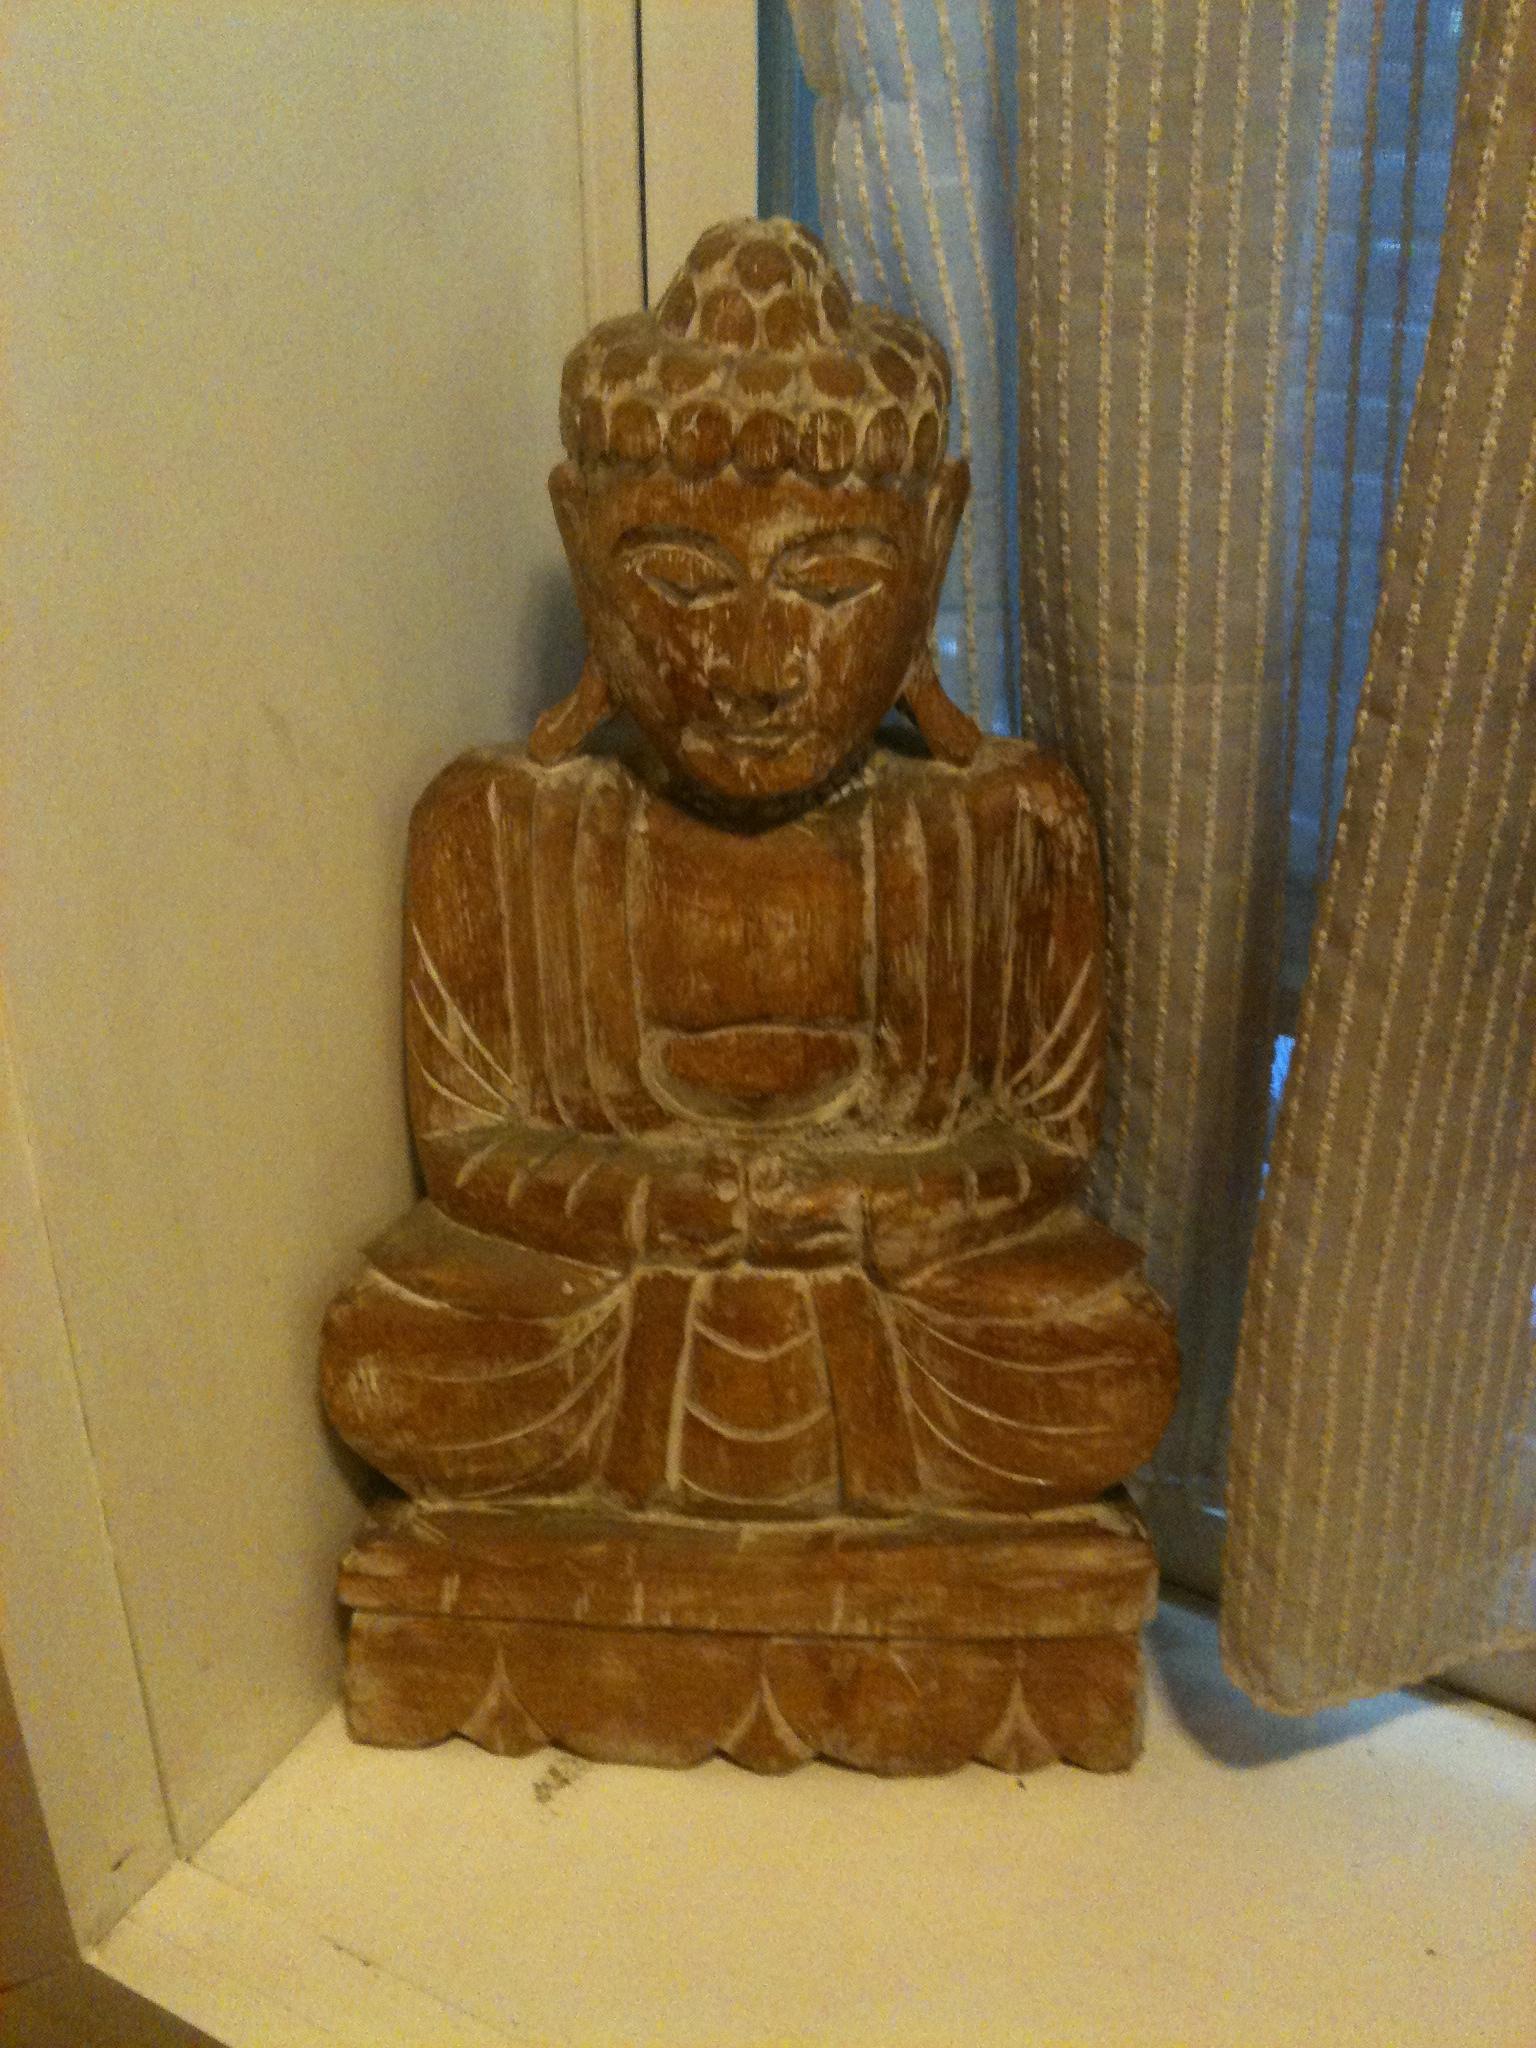 Giant Buddha watching over patrons of the Good Karma Café bathroom...